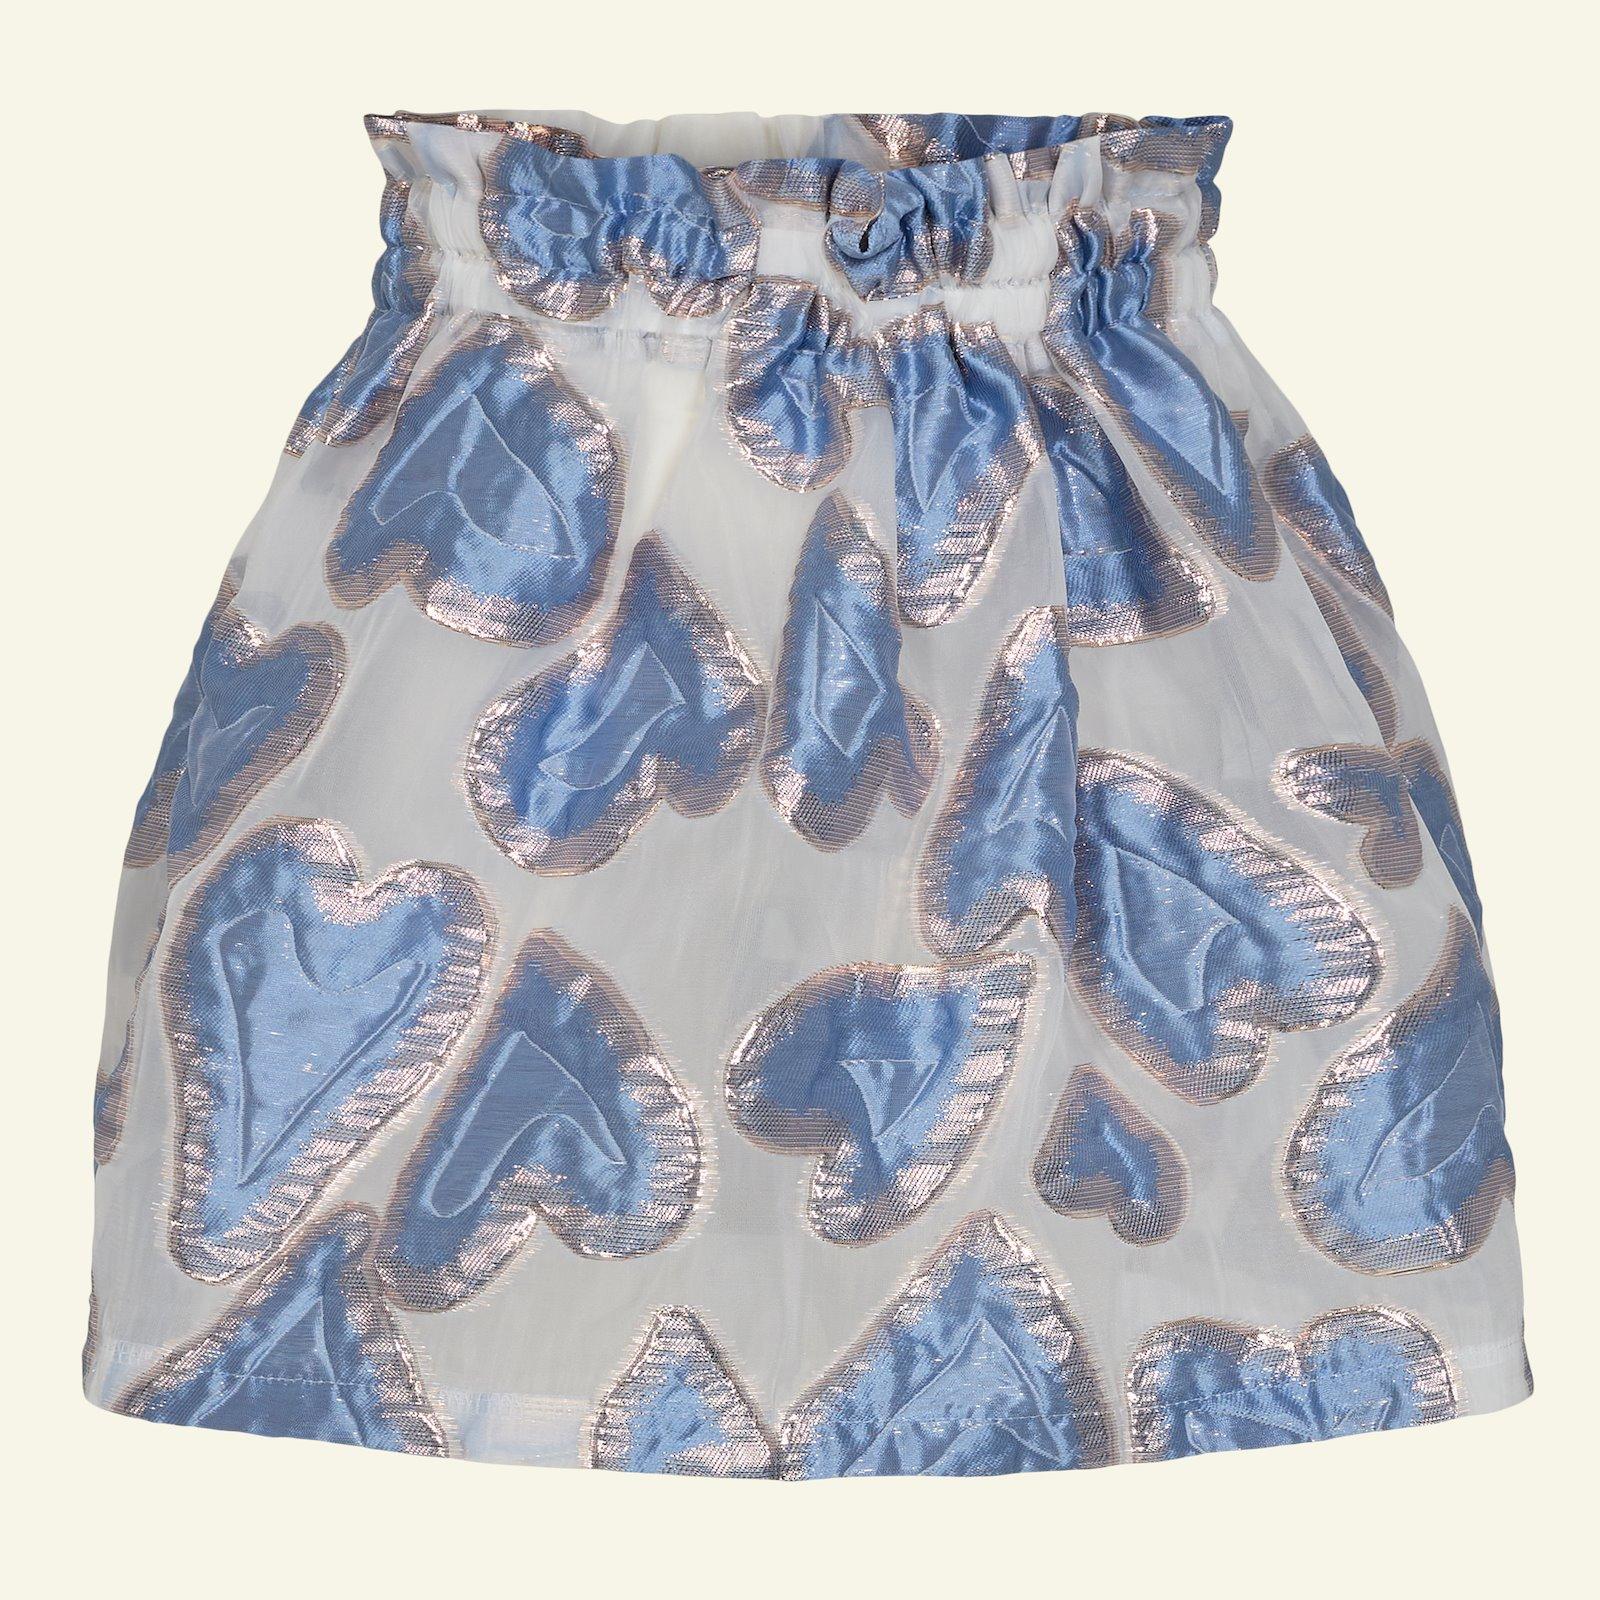 Wide skirt p61020_670266_sskit